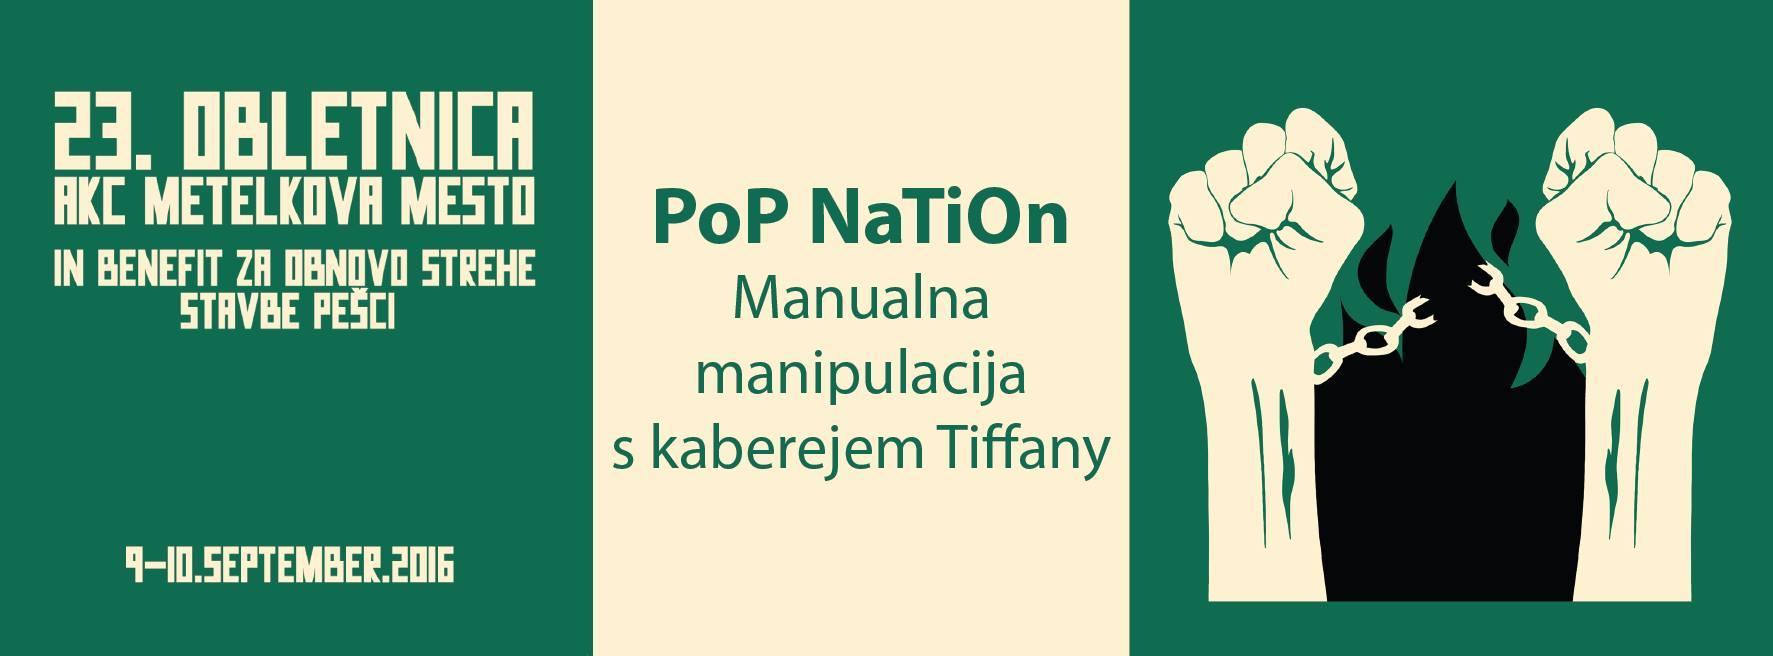 popnation992016_obletnica